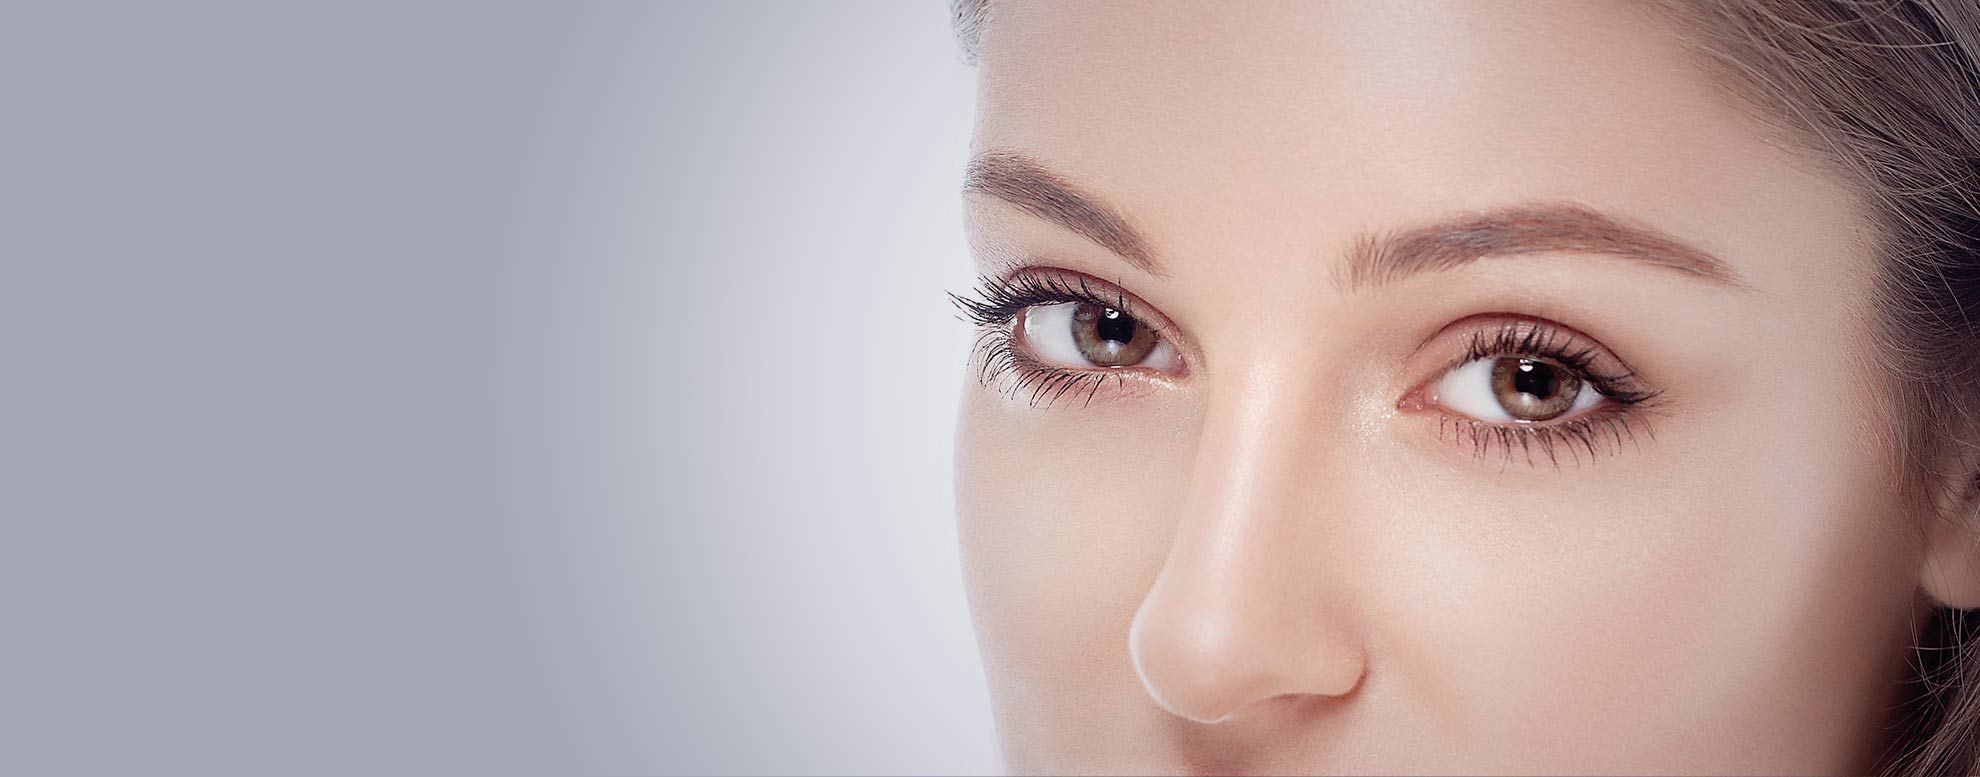 Eye Bags - The Aesthetic Skin Clinic